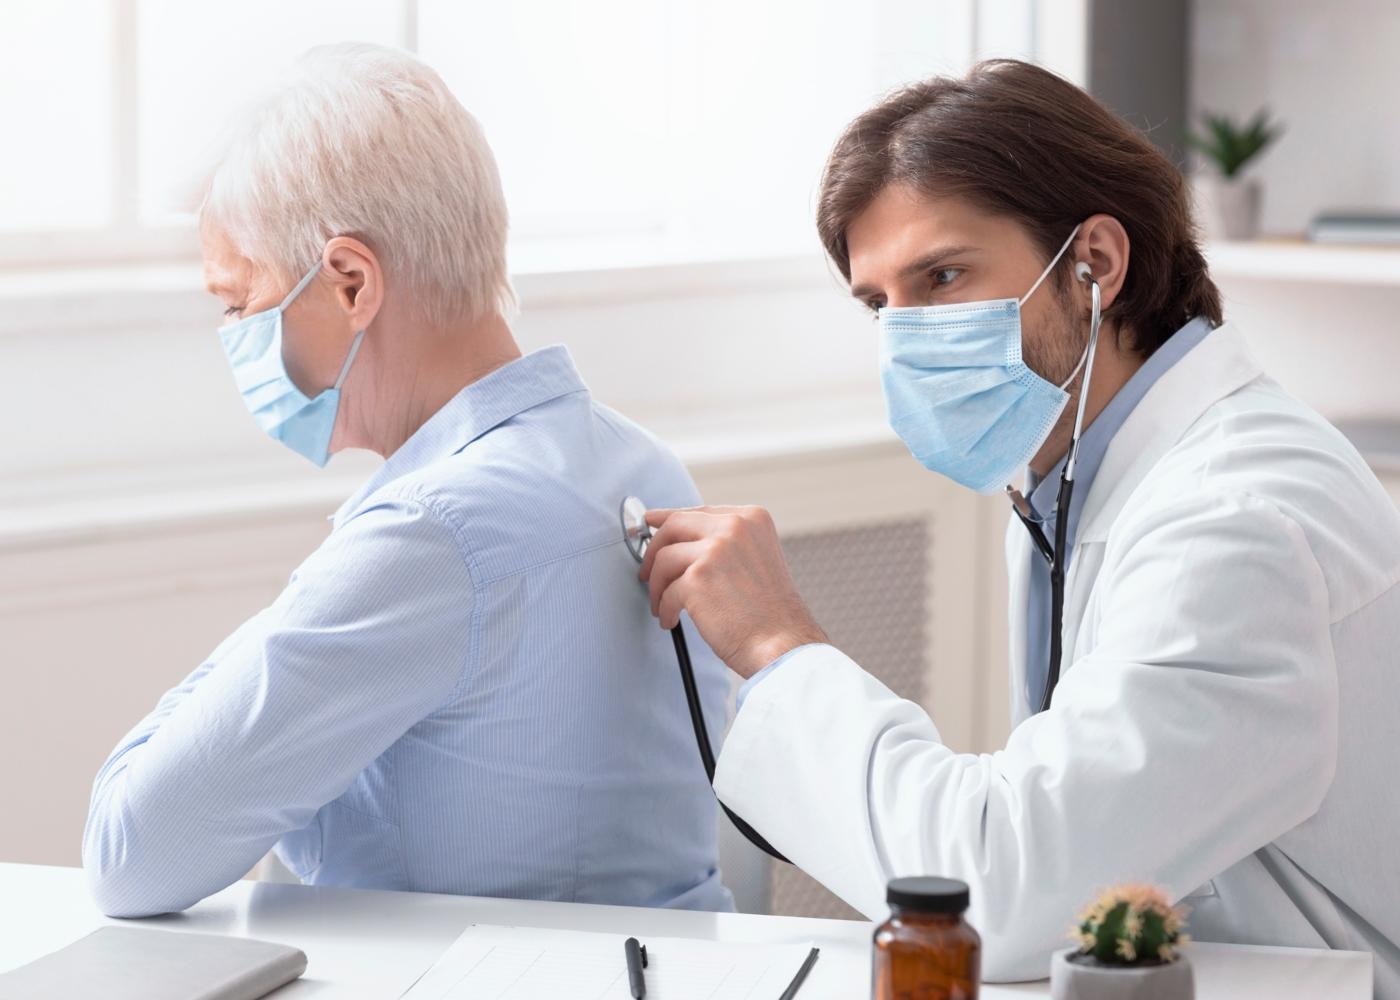 Médico a auscultar paciente